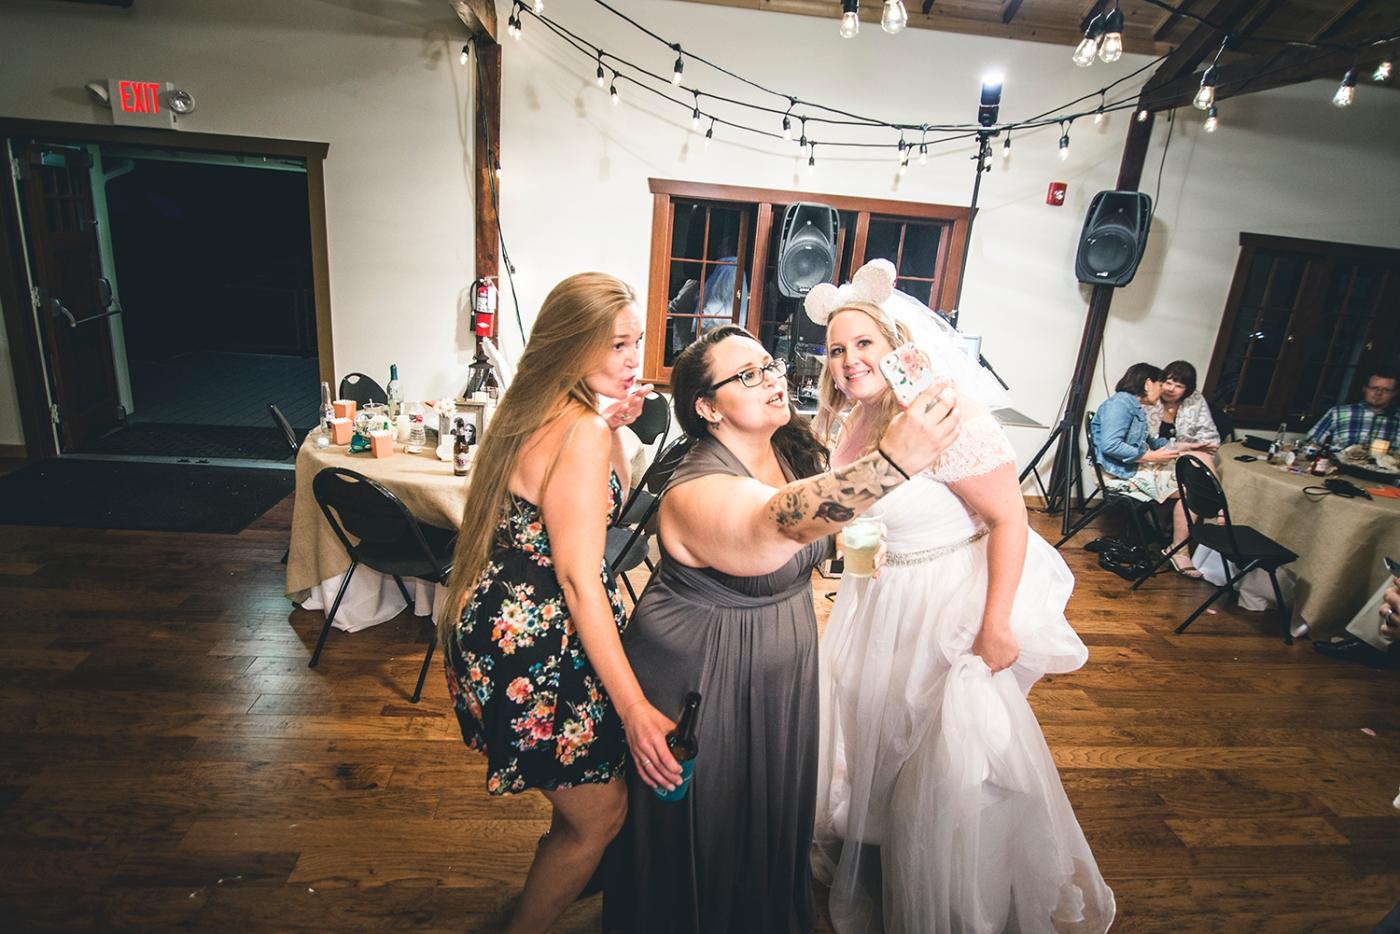 Jane_S_Seattle_photography_Kadie_and_Steve_2016_Des_Moines_Marina_Wedding_DSC_1344DSC_2778